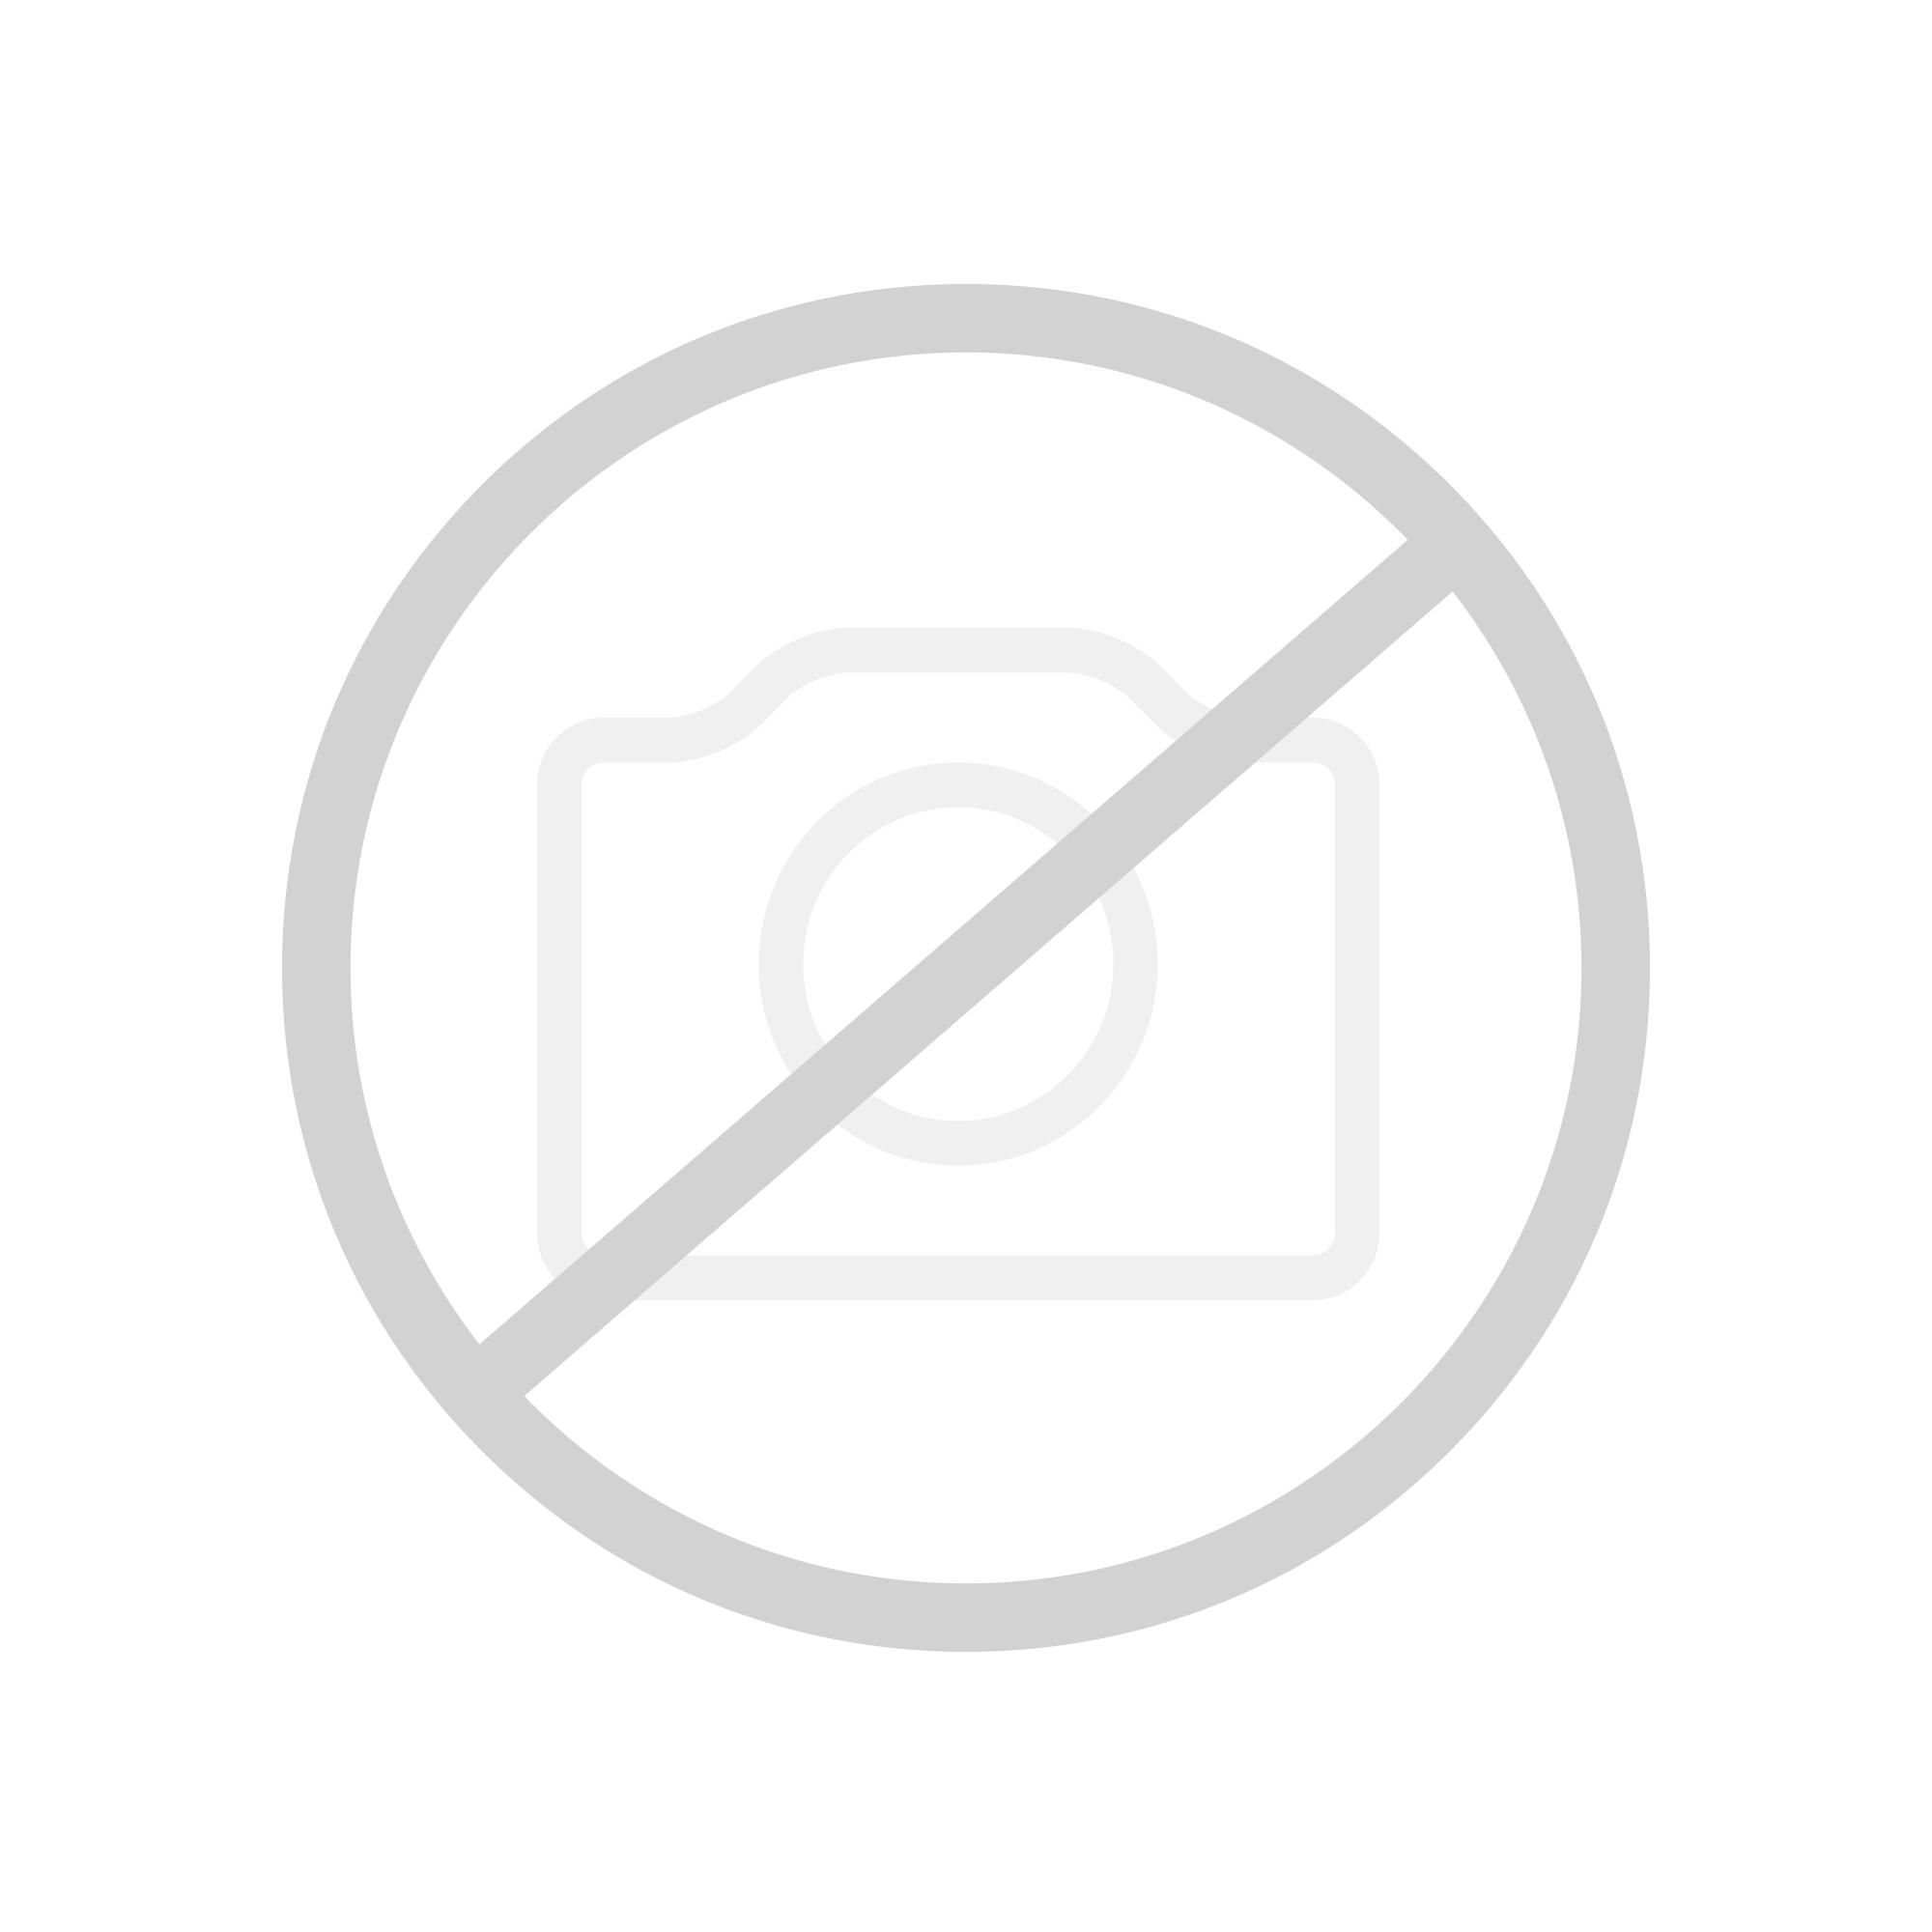 louis poulsen panthella tischleuchte 5744163415 reuter. Black Bedroom Furniture Sets. Home Design Ideas